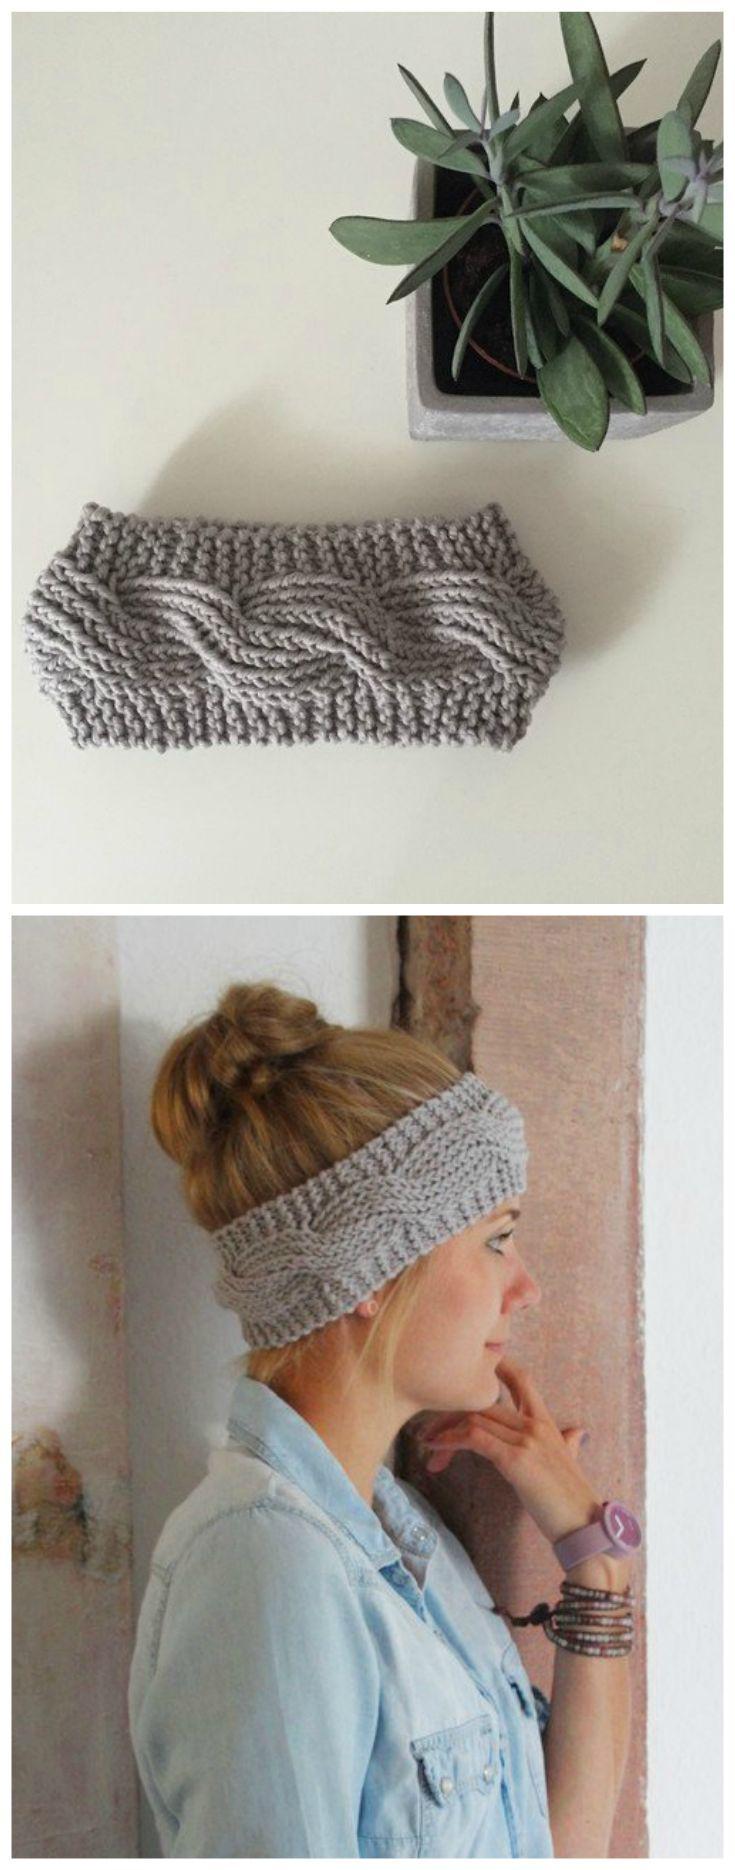 Gestricktes Stirnband aus Merinowolle, Winter Accessoire / winterly accessory: knitted headband in light grey made by die zimtbluete via DaWanda.com